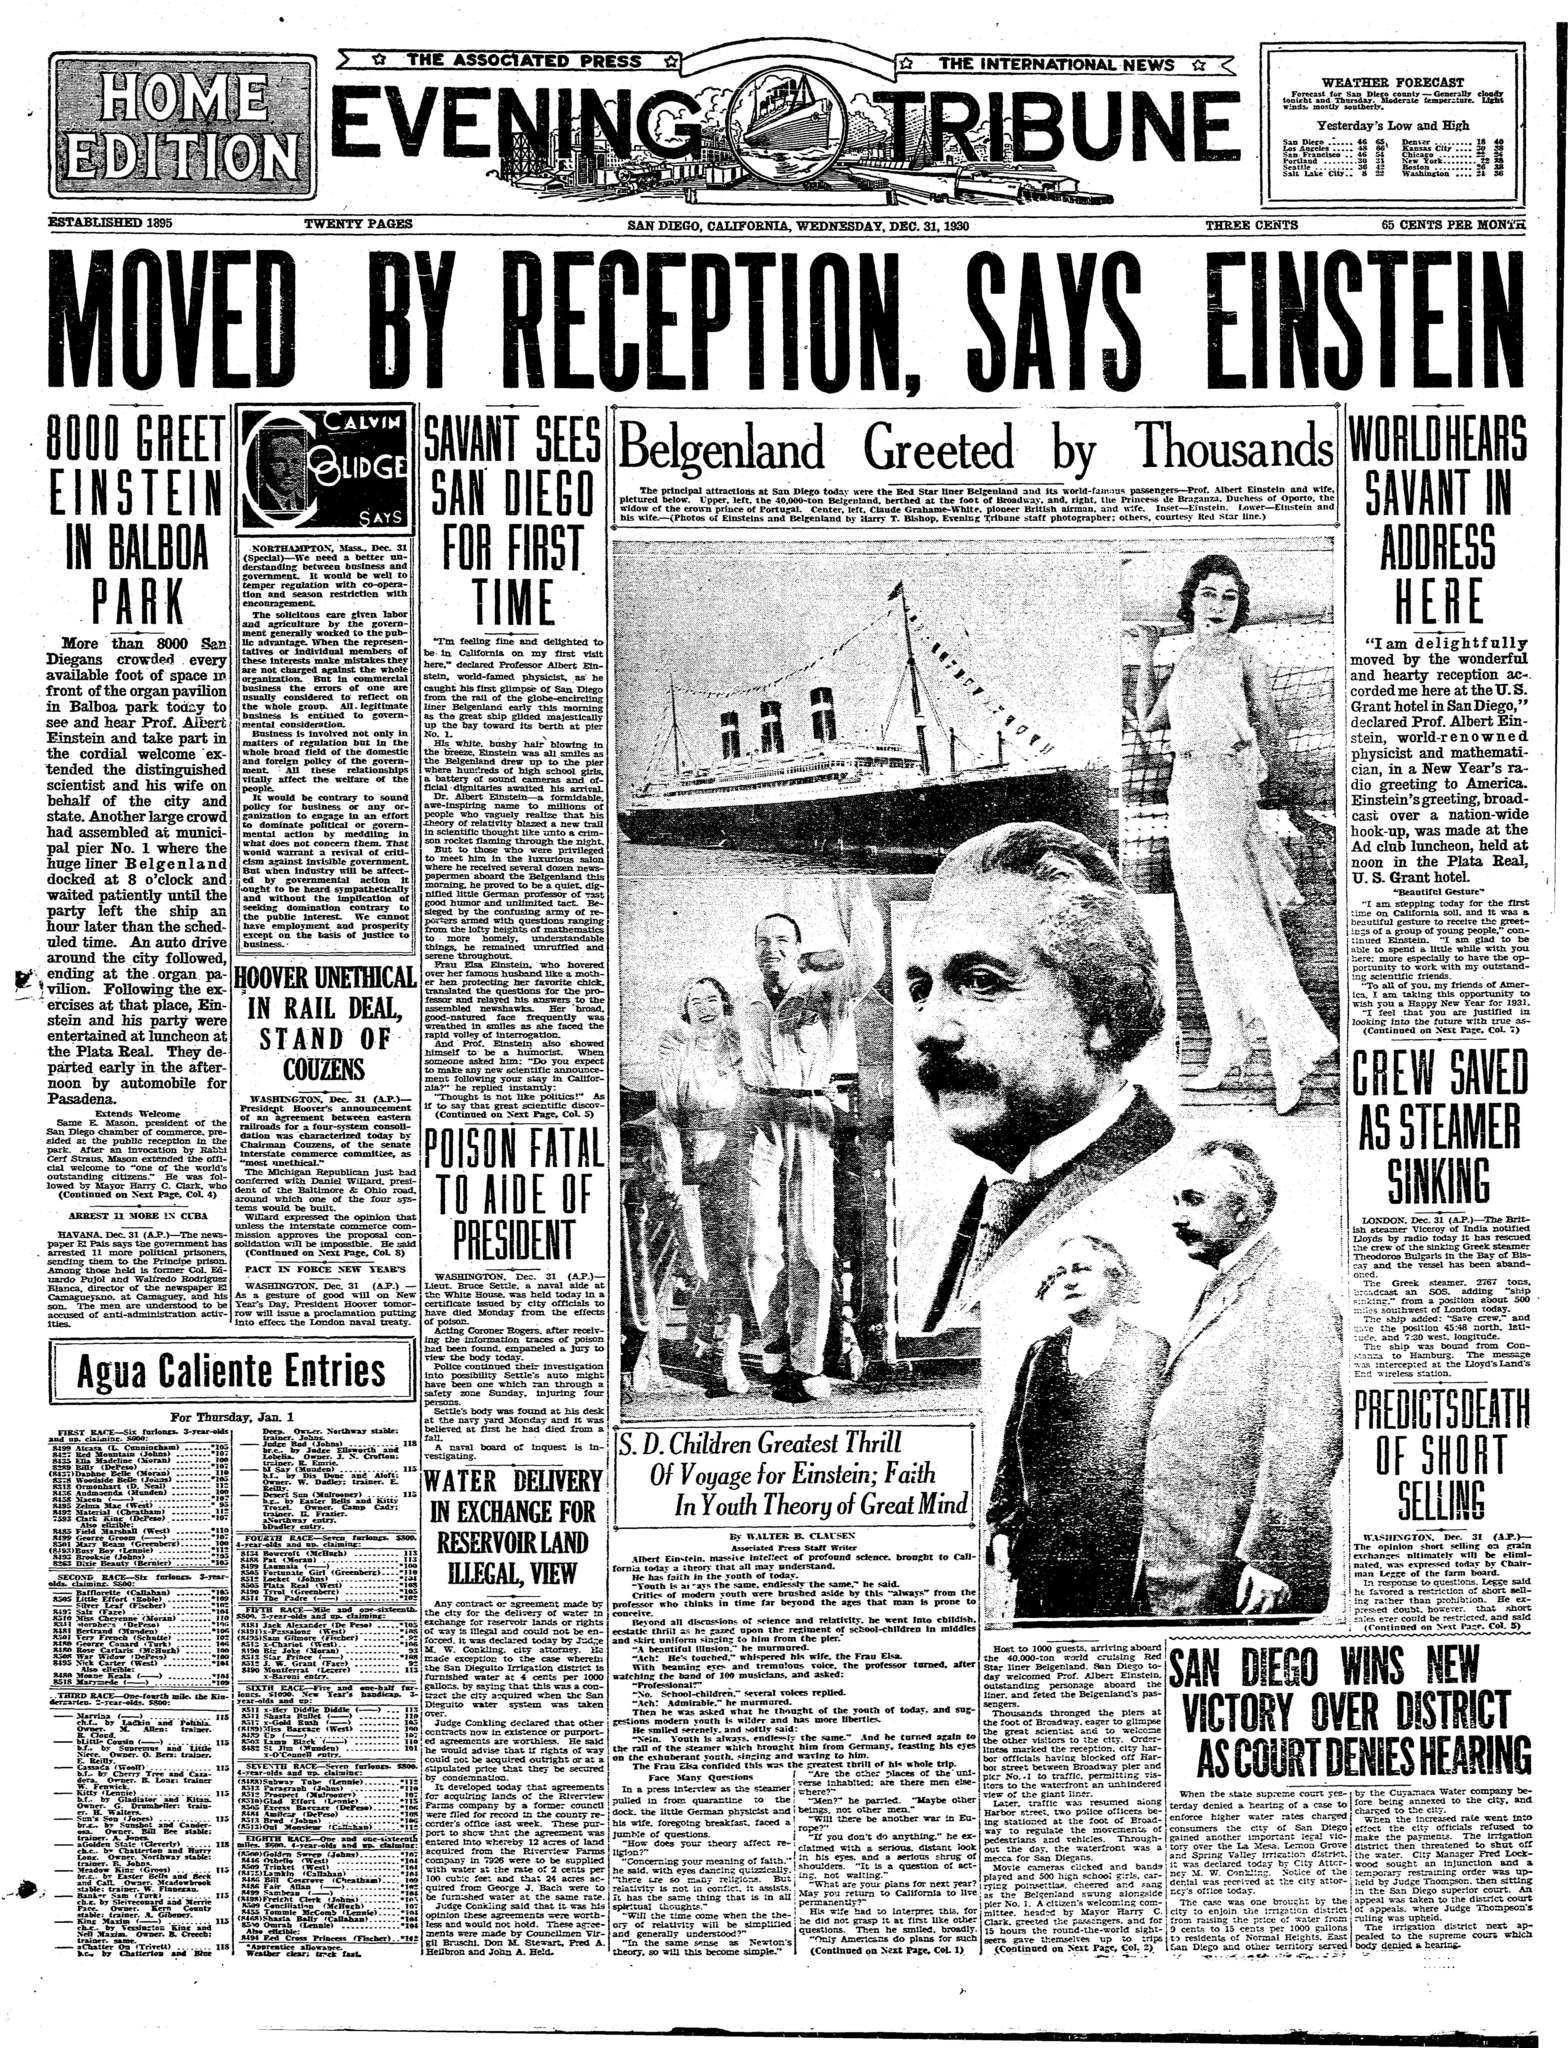 December 31, 1930